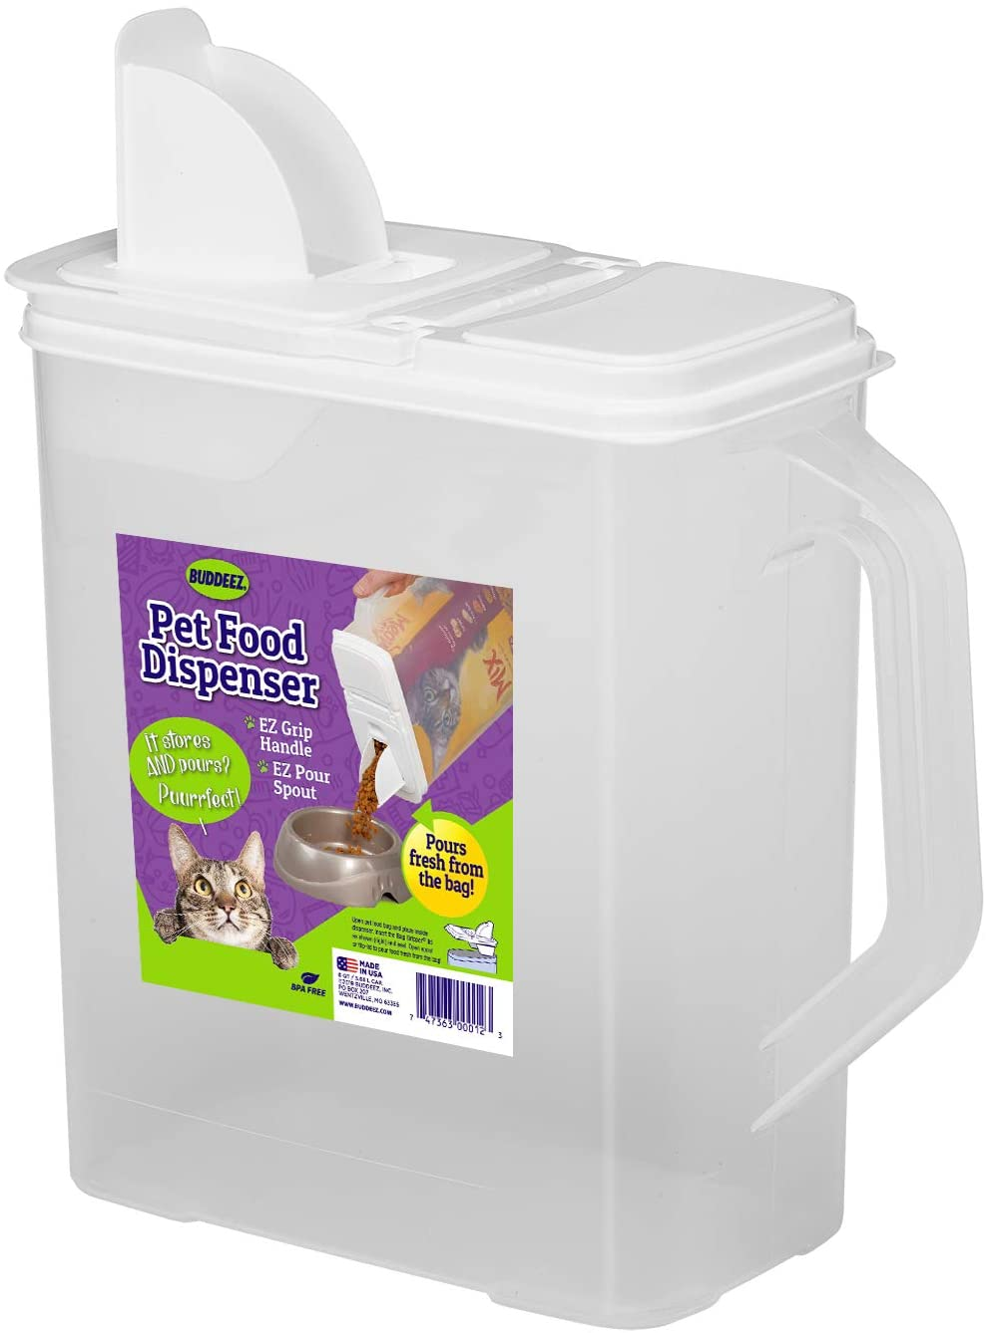 Buddeez 6-Quart Dispenser for Pet Food and Bird Seed, White, Large (01206W-BAG)